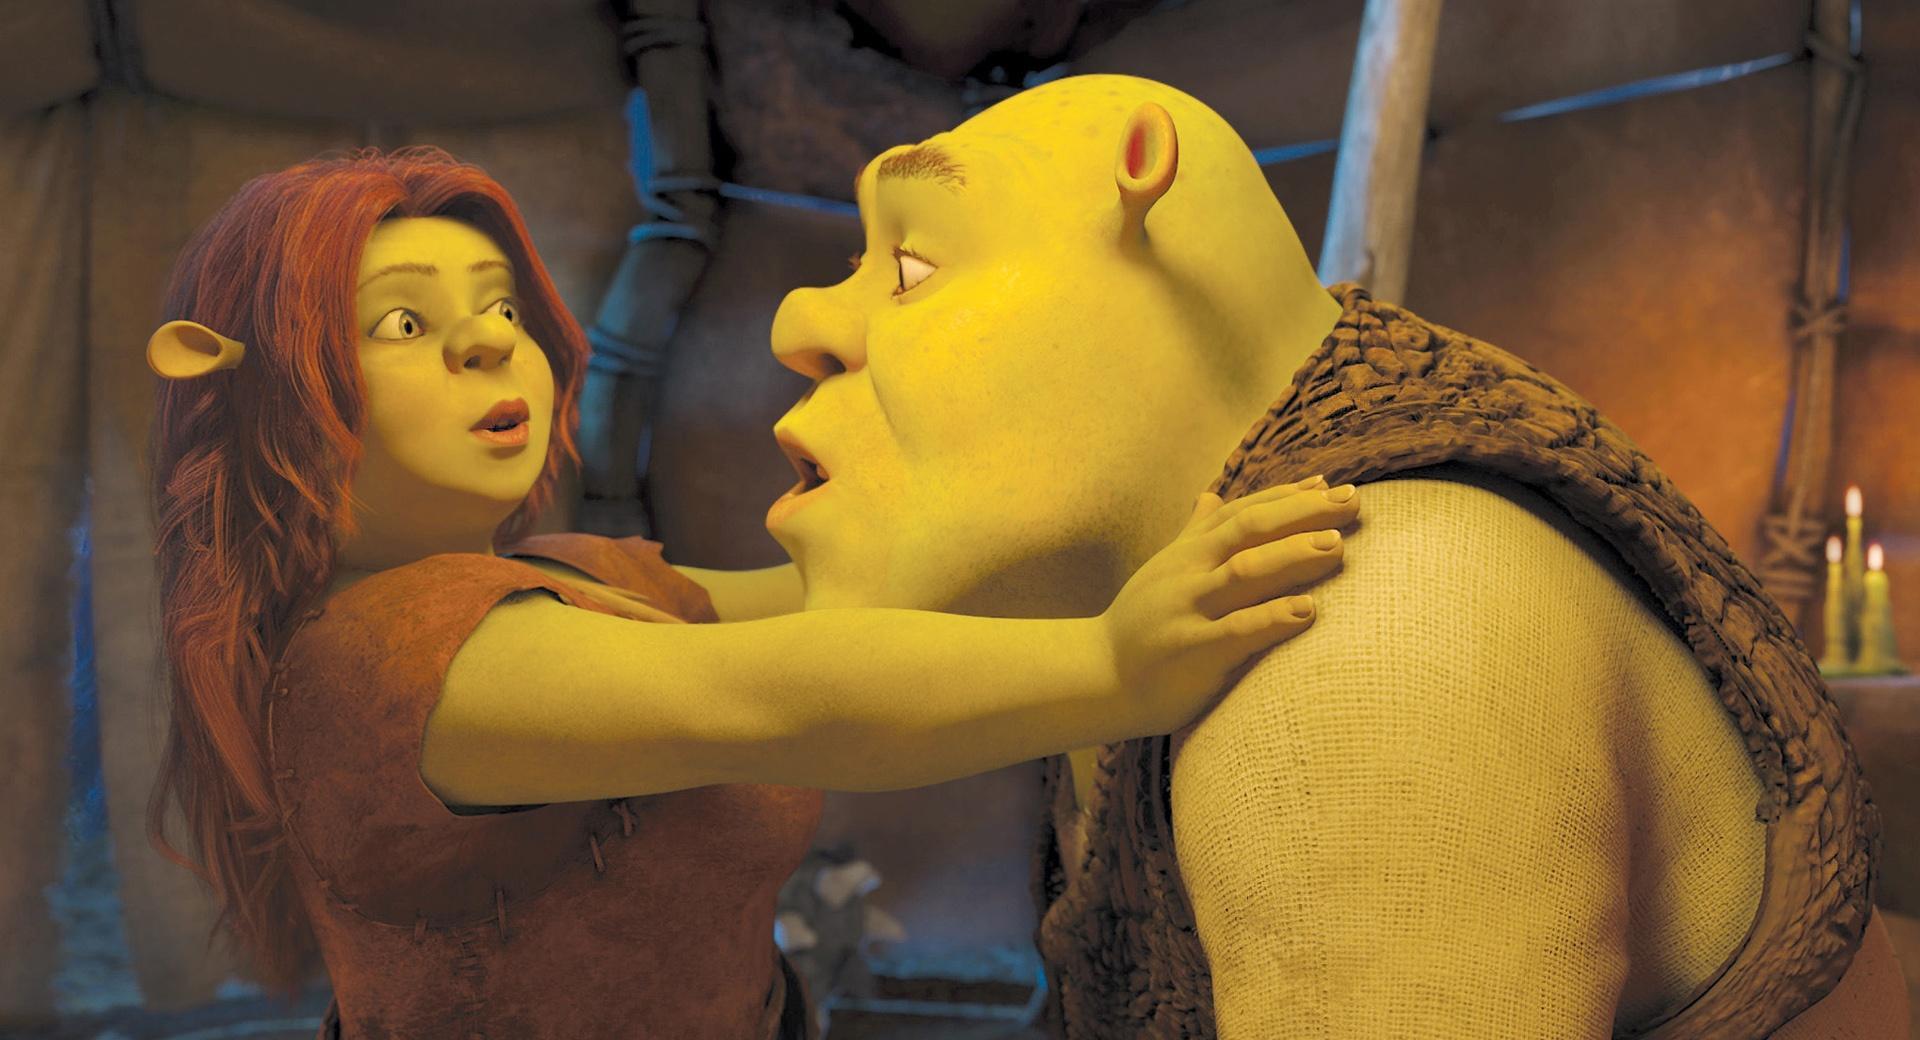 Princess Fiona and Shrek wallpapers HD quality